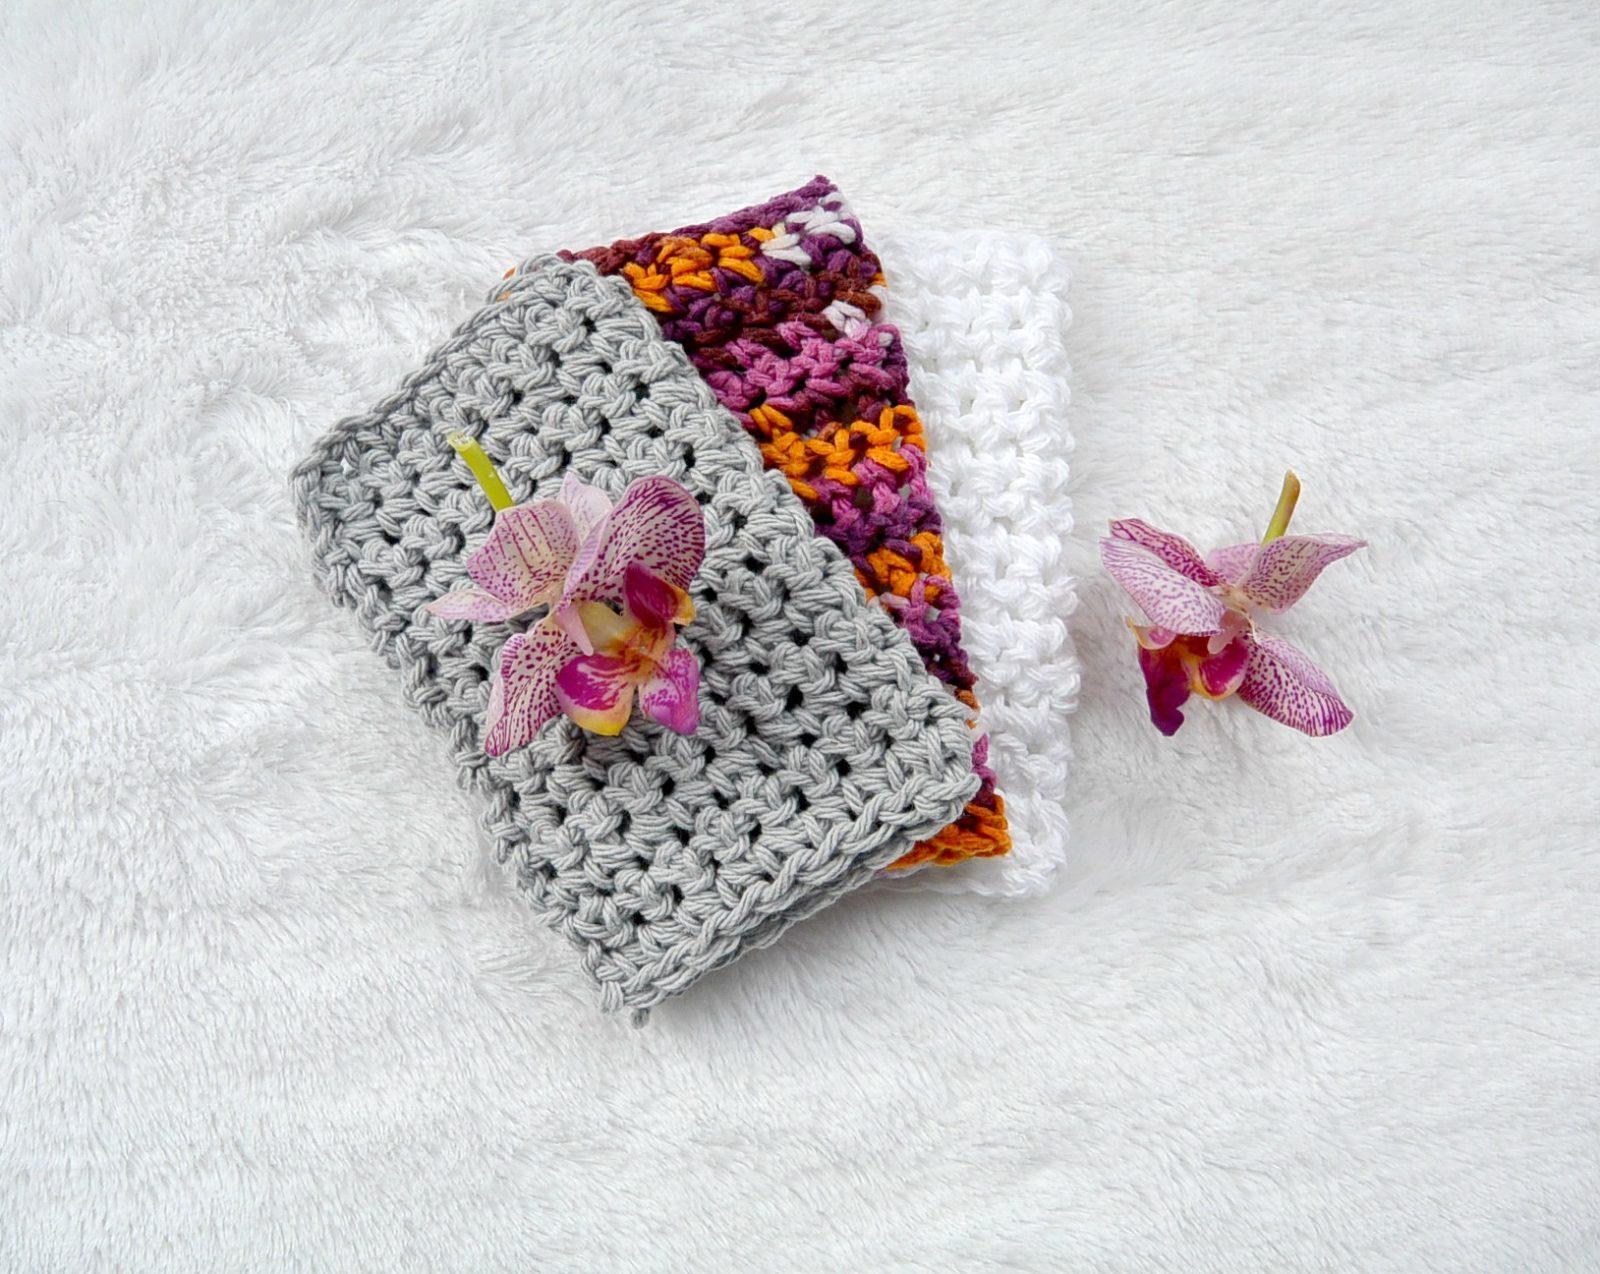 True Beginner-First Project Crochet Washcloth